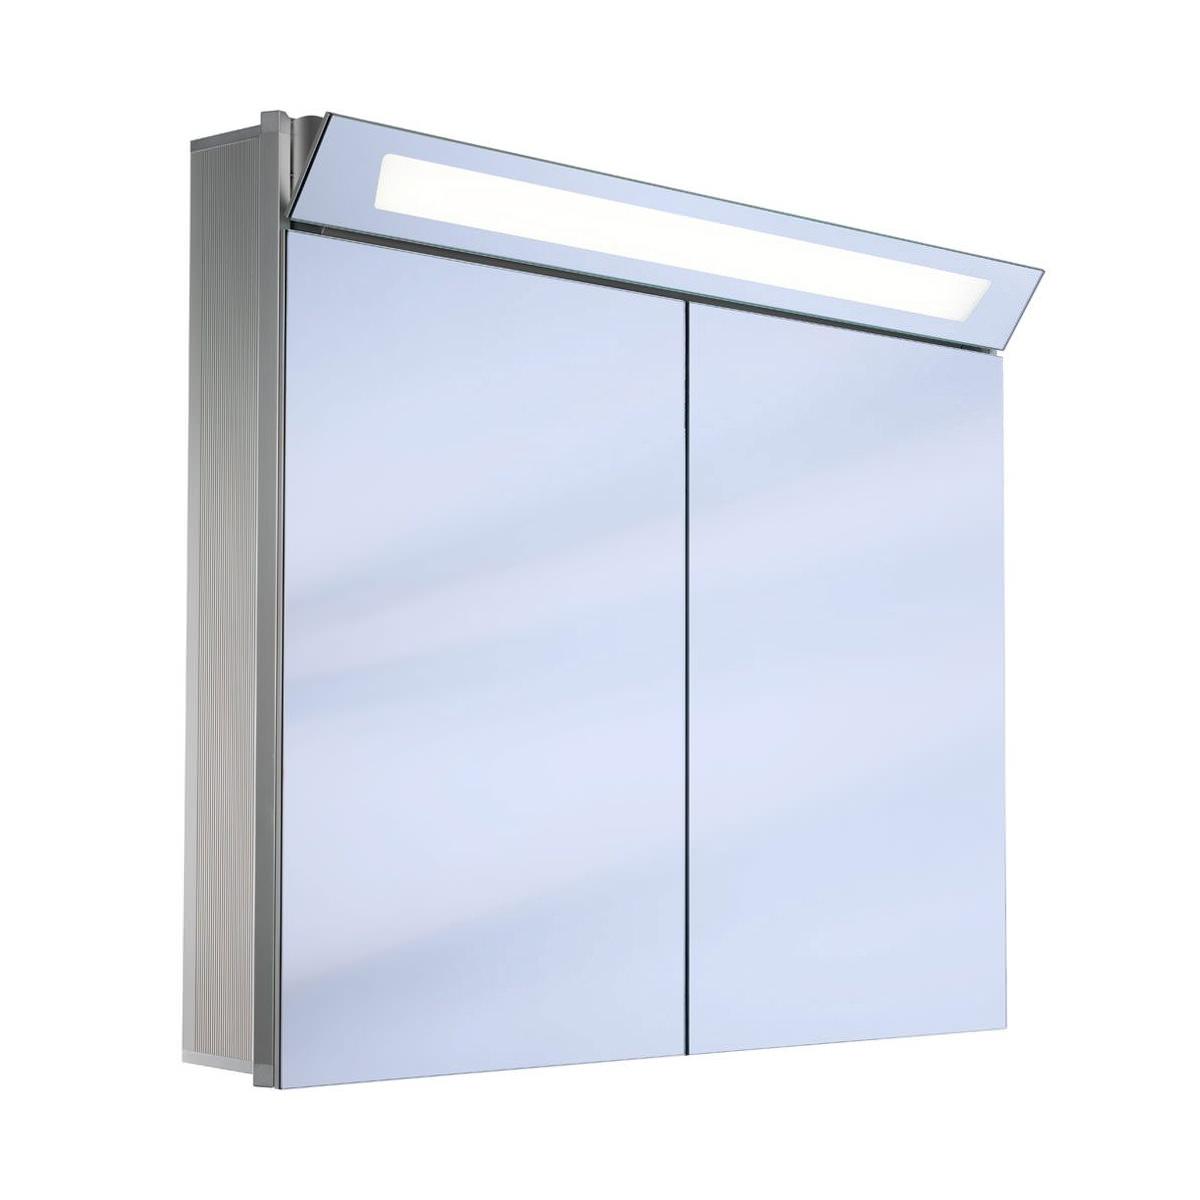 Schneider capeline 2 door illuminated mirror cabinet 1200mm for Bathroom cabinets 1200mm wide